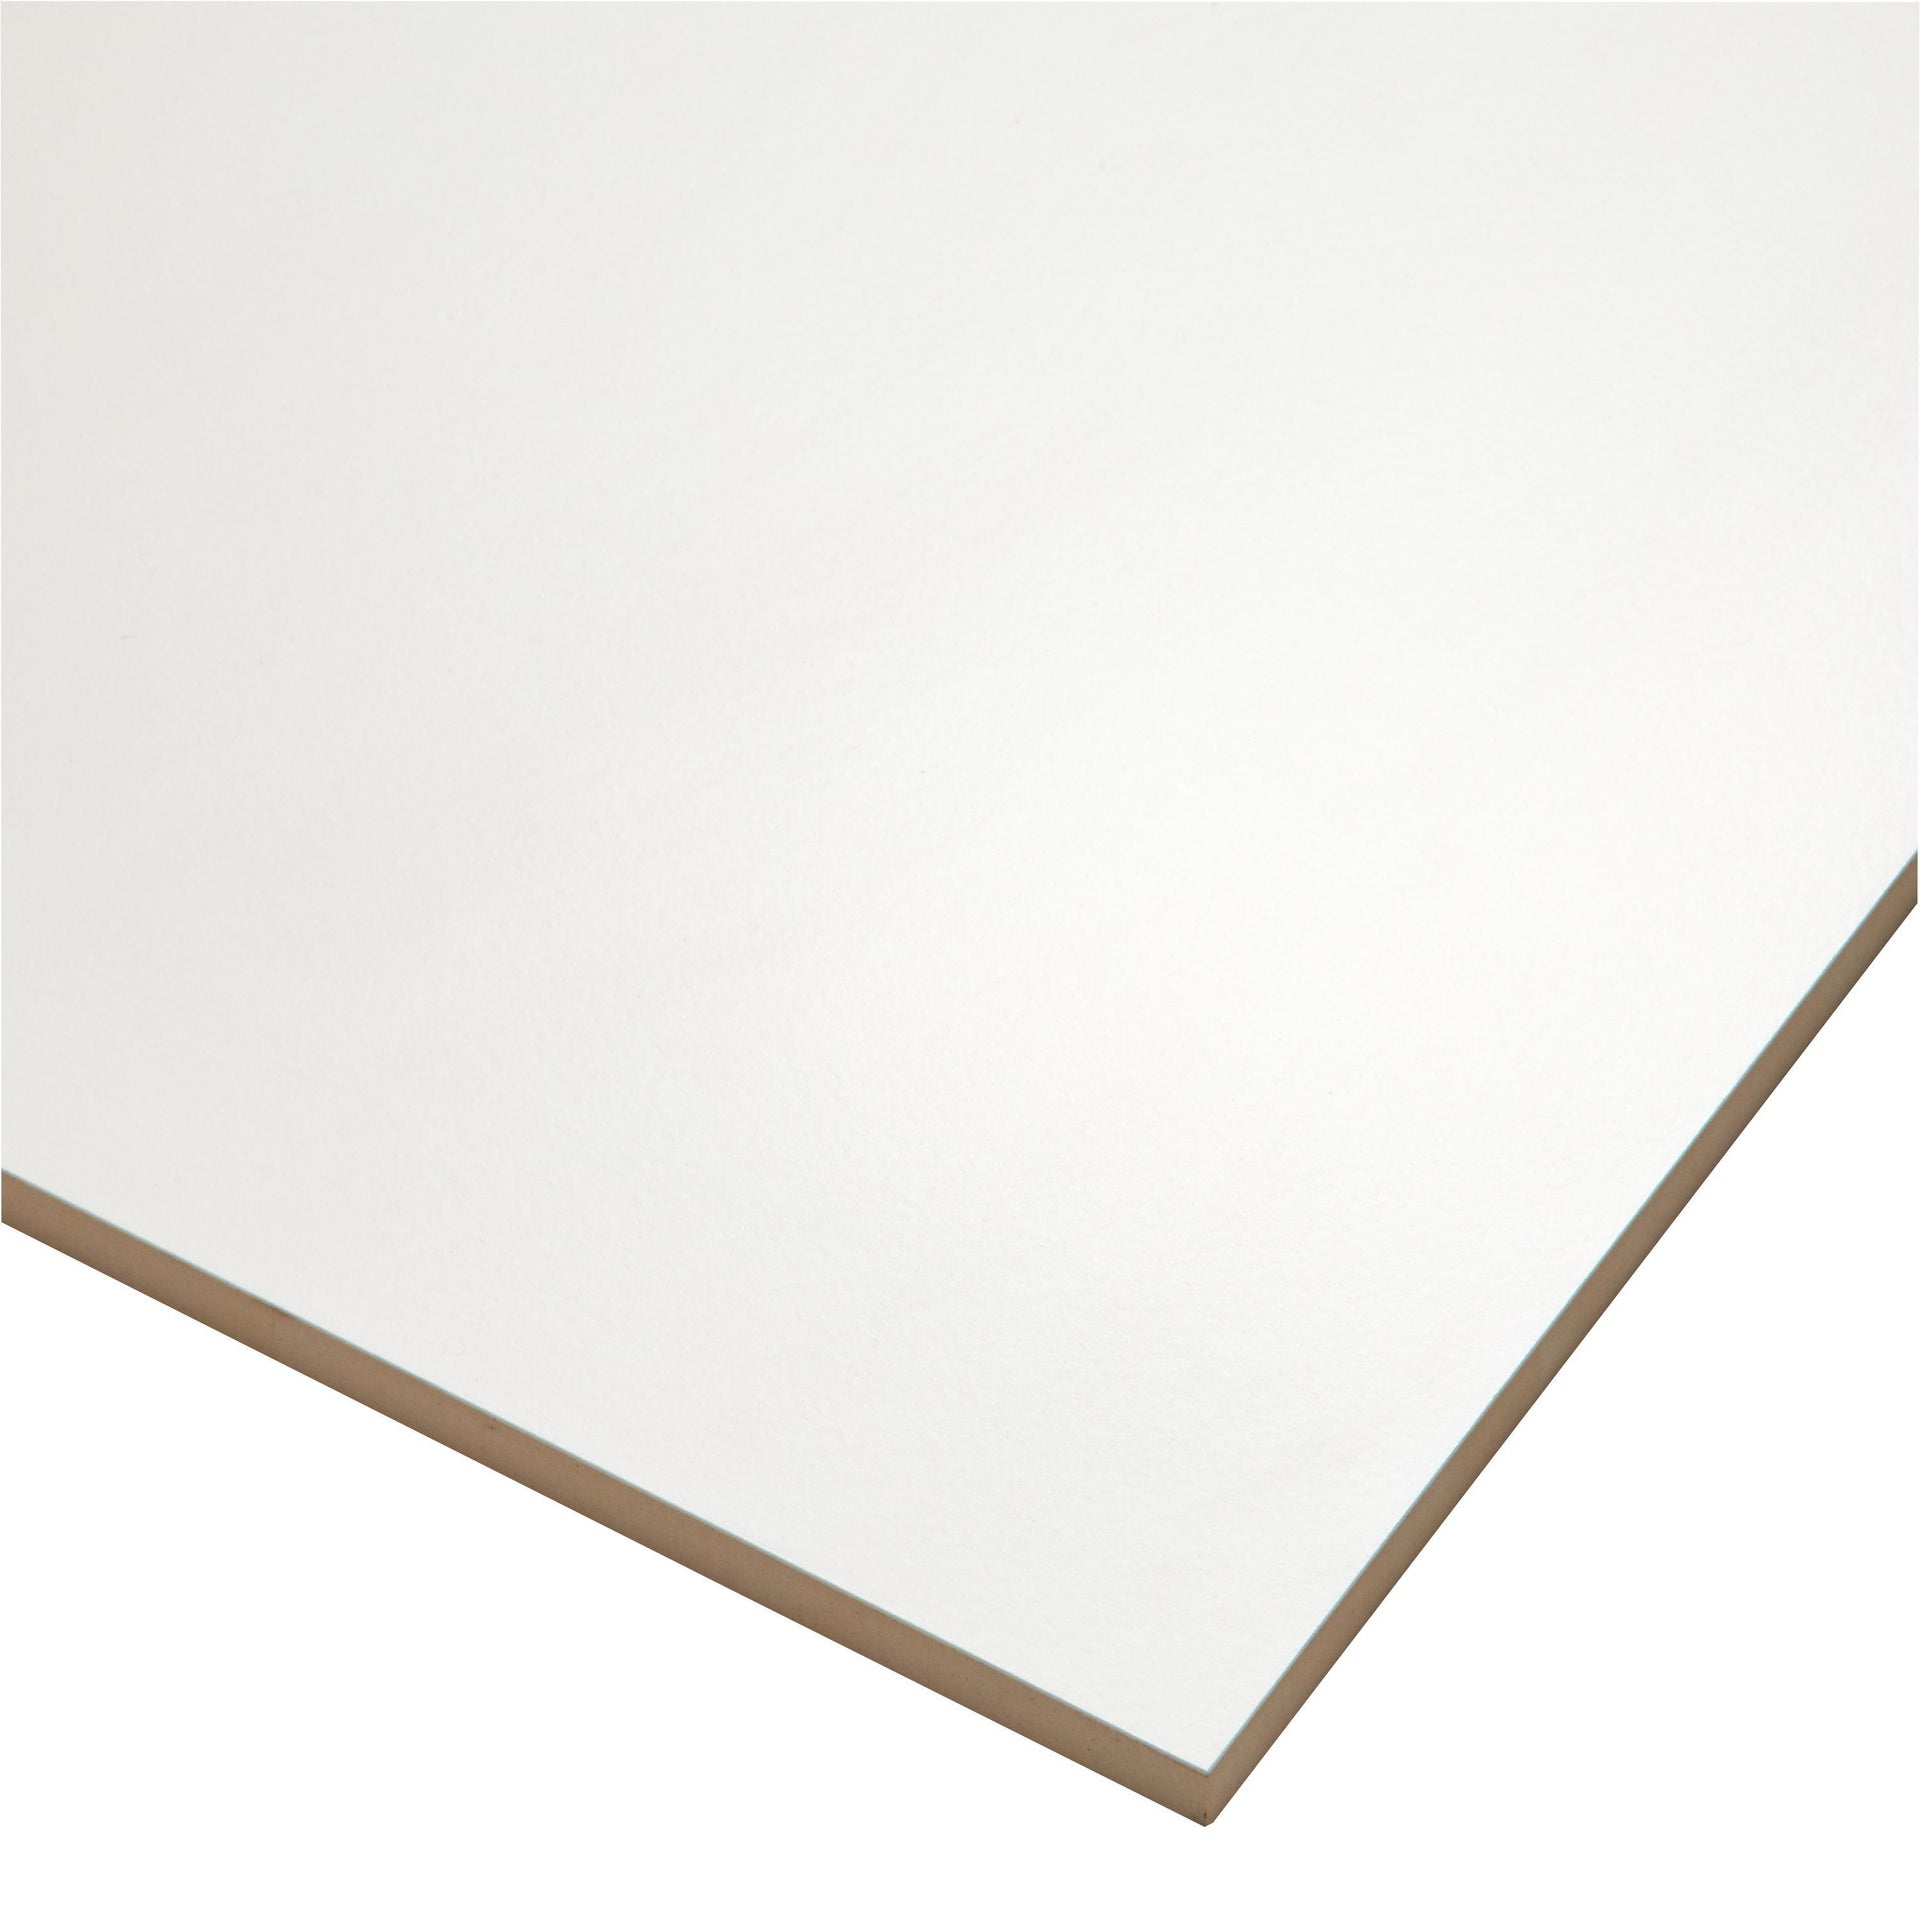 Piastrella per rivestimenti Arctic 30 x 90 cm sp. 10 mm bianco - 2